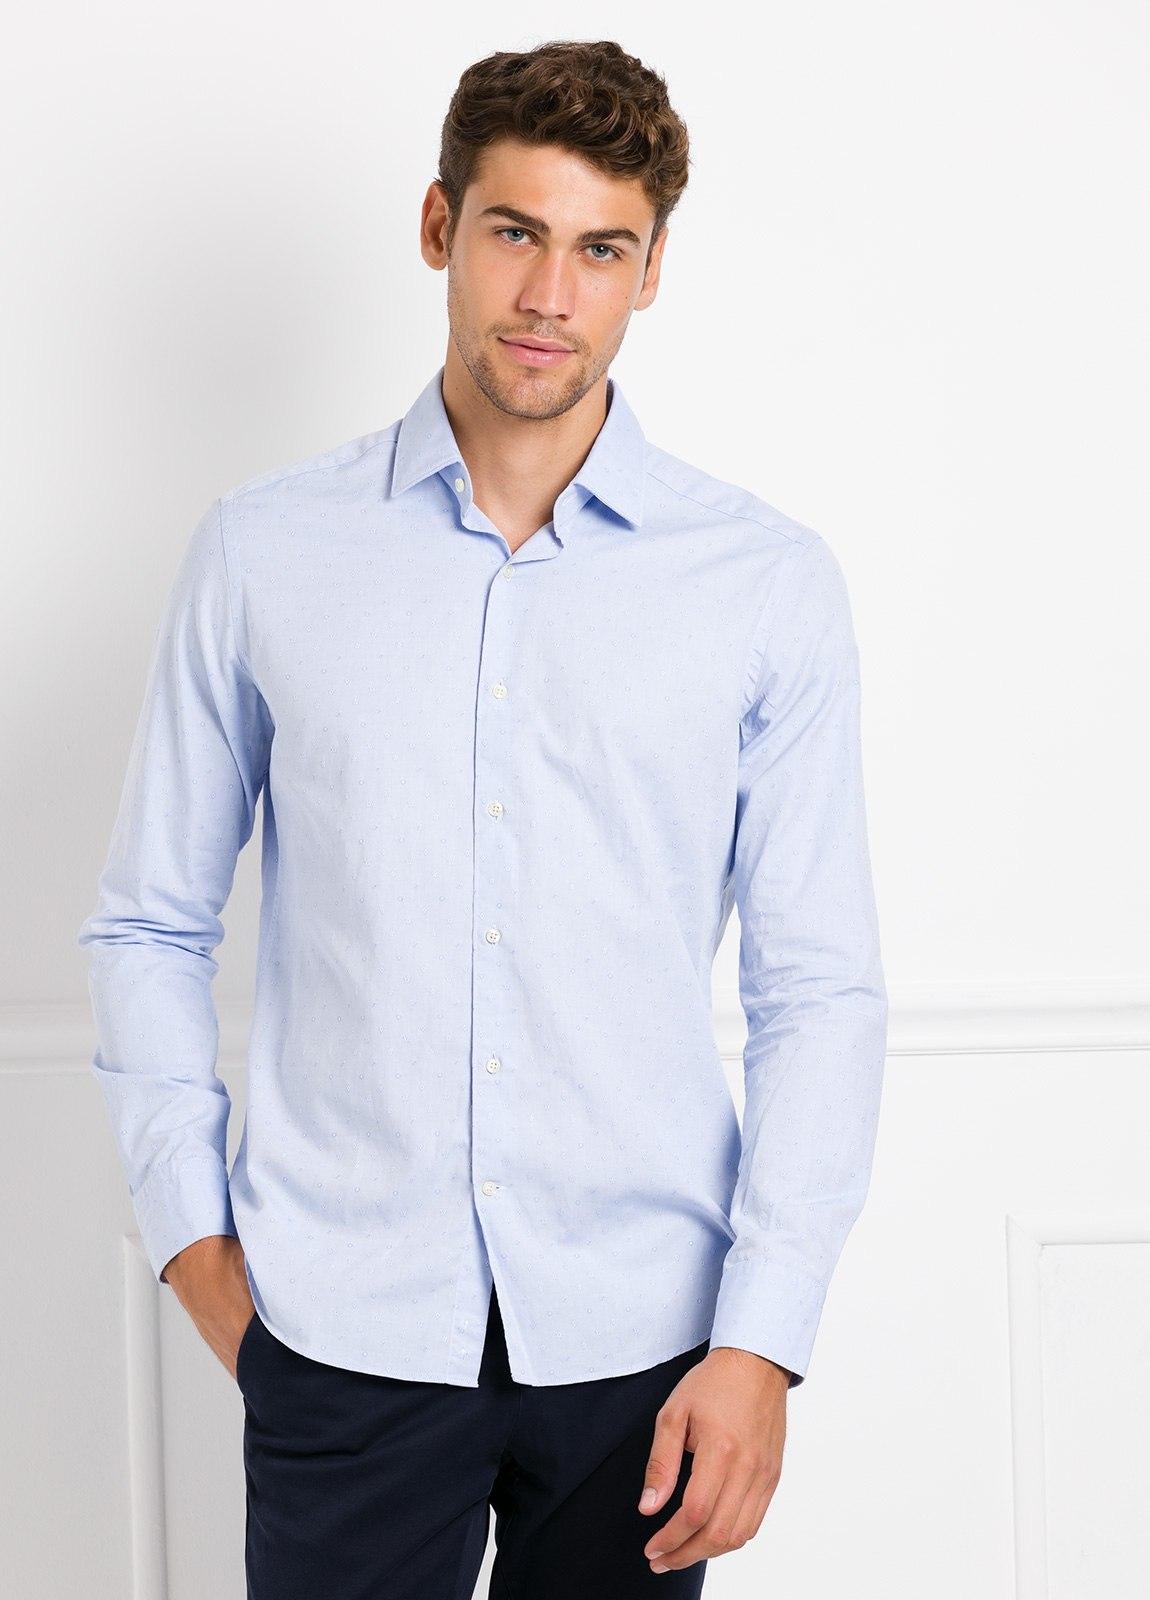 Camisa Leisure Wear REGULAR FIT modelo PORTO tejido dibujo jacquard color celeste. 100% Algodón.